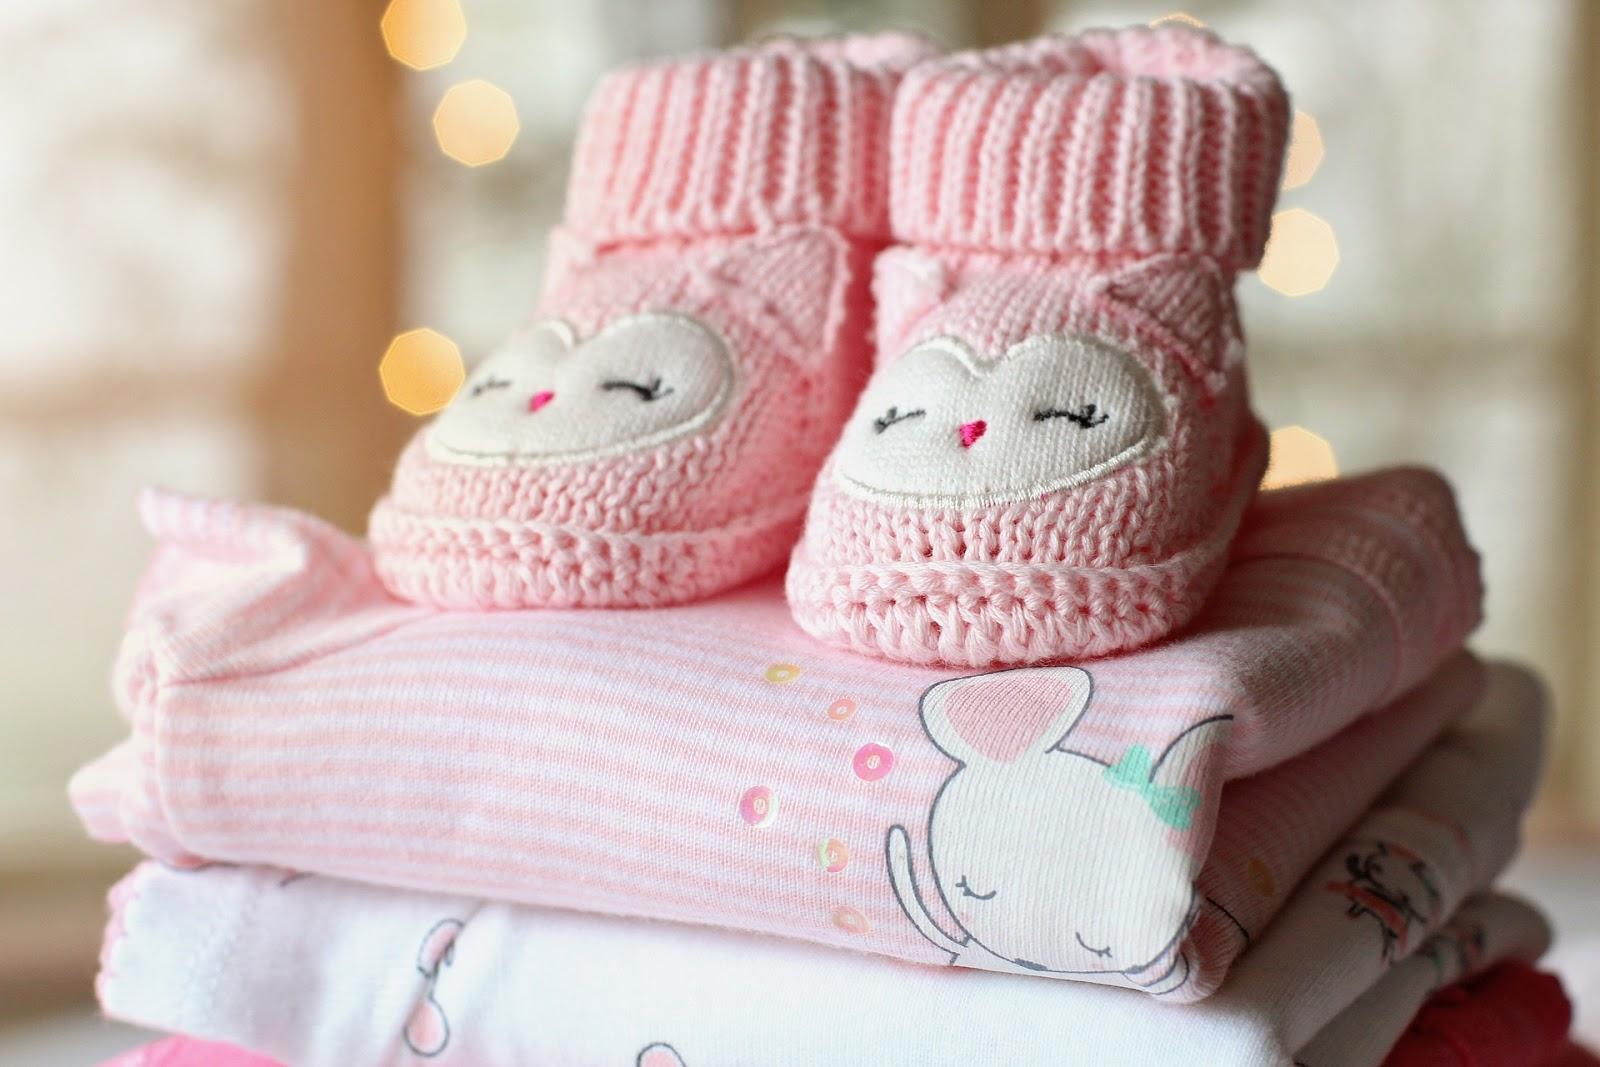 baby-shower, baby-shower-prezenty, baby-shower-dekoracje